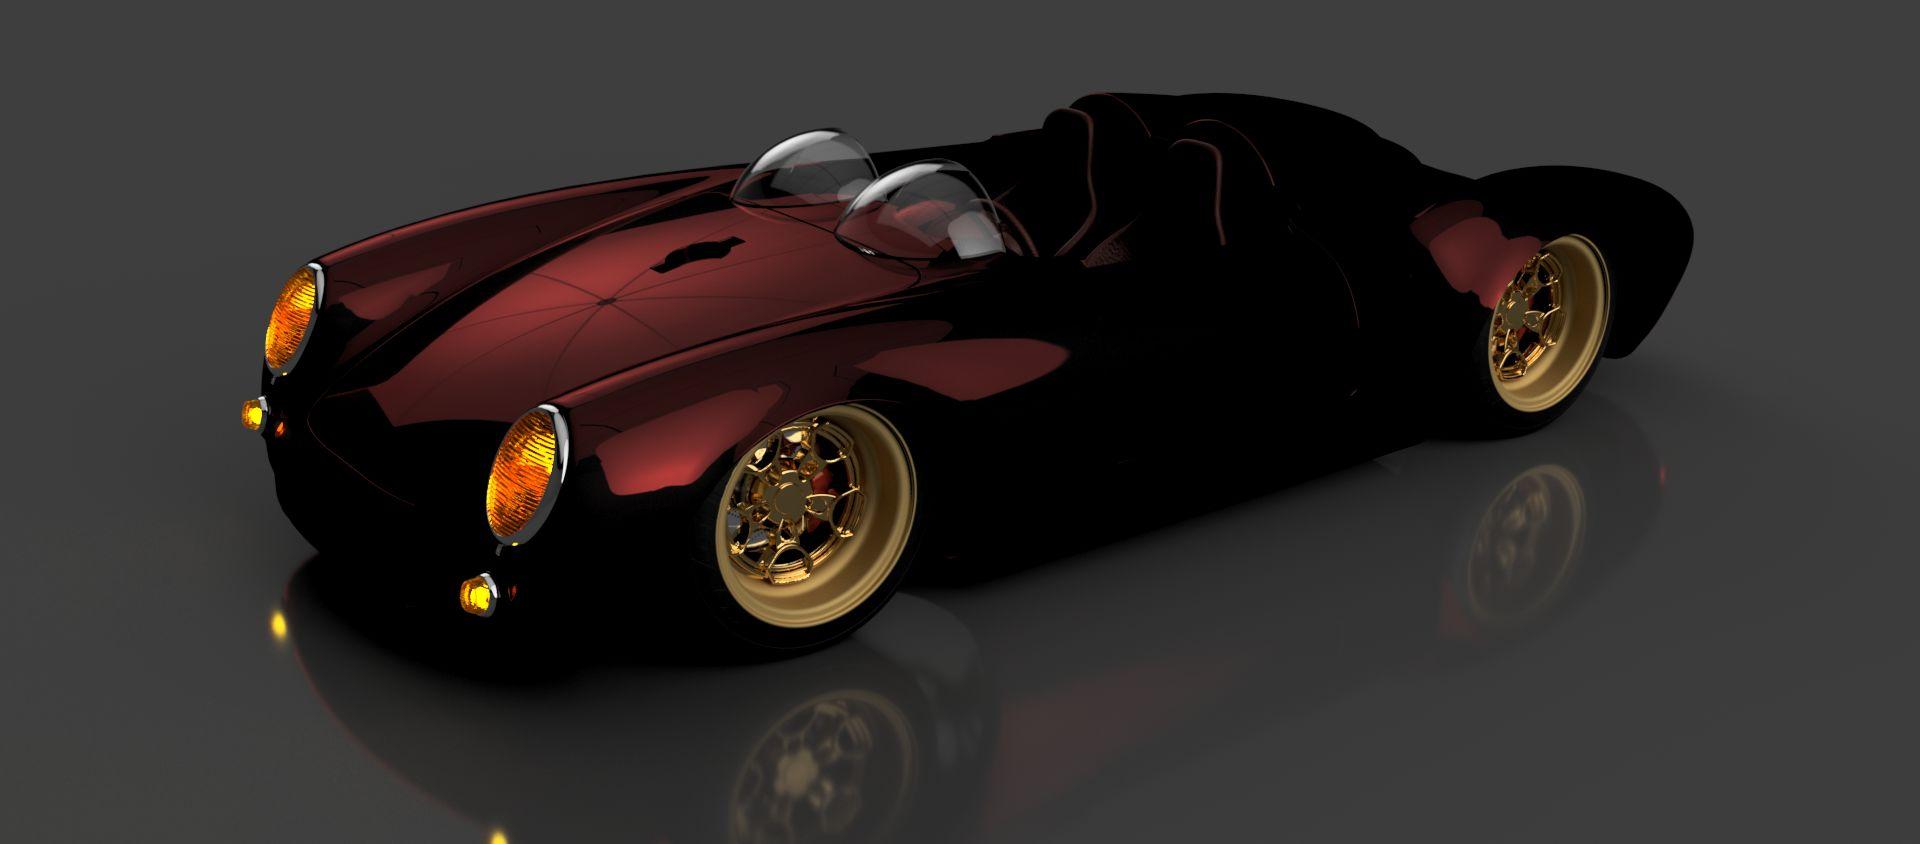 Porsche-550-spyder-v5-5-3500-3500